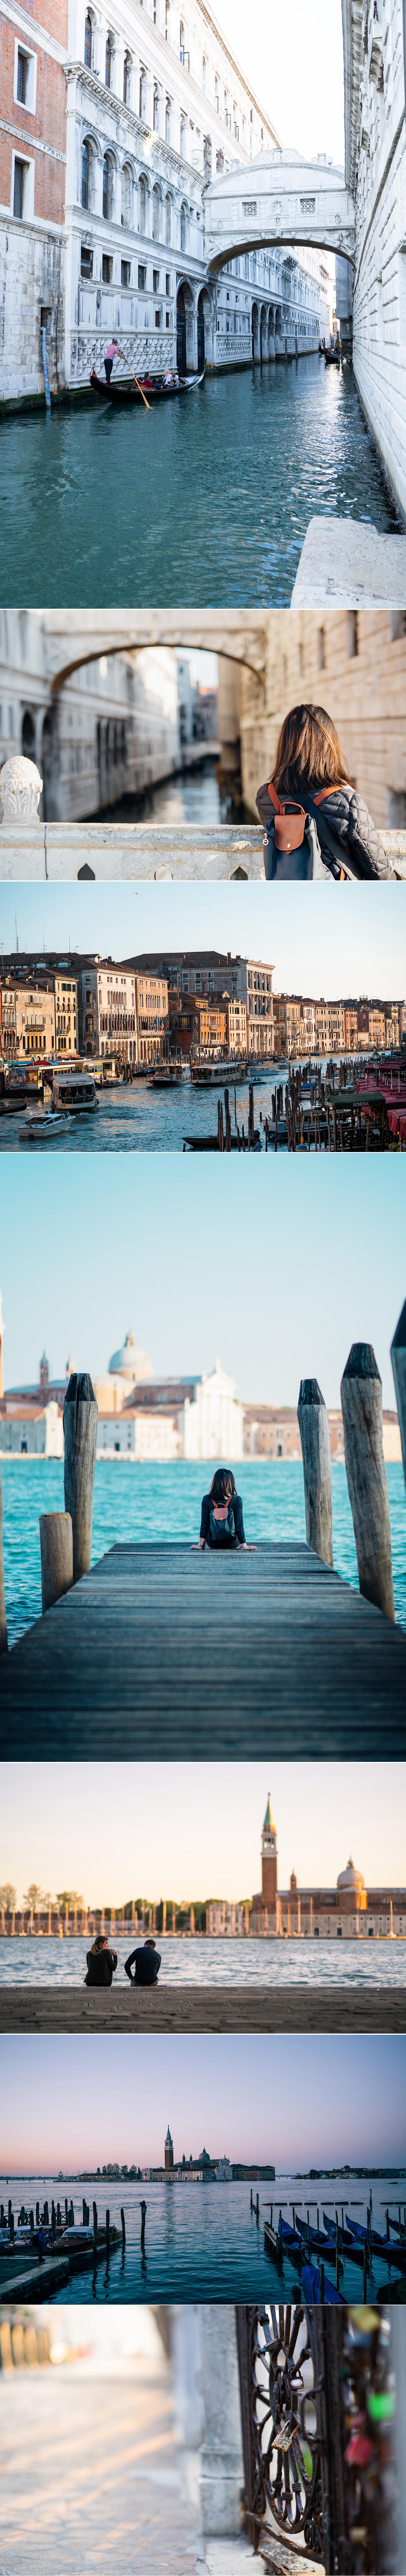 Venice - Wandering.jpg